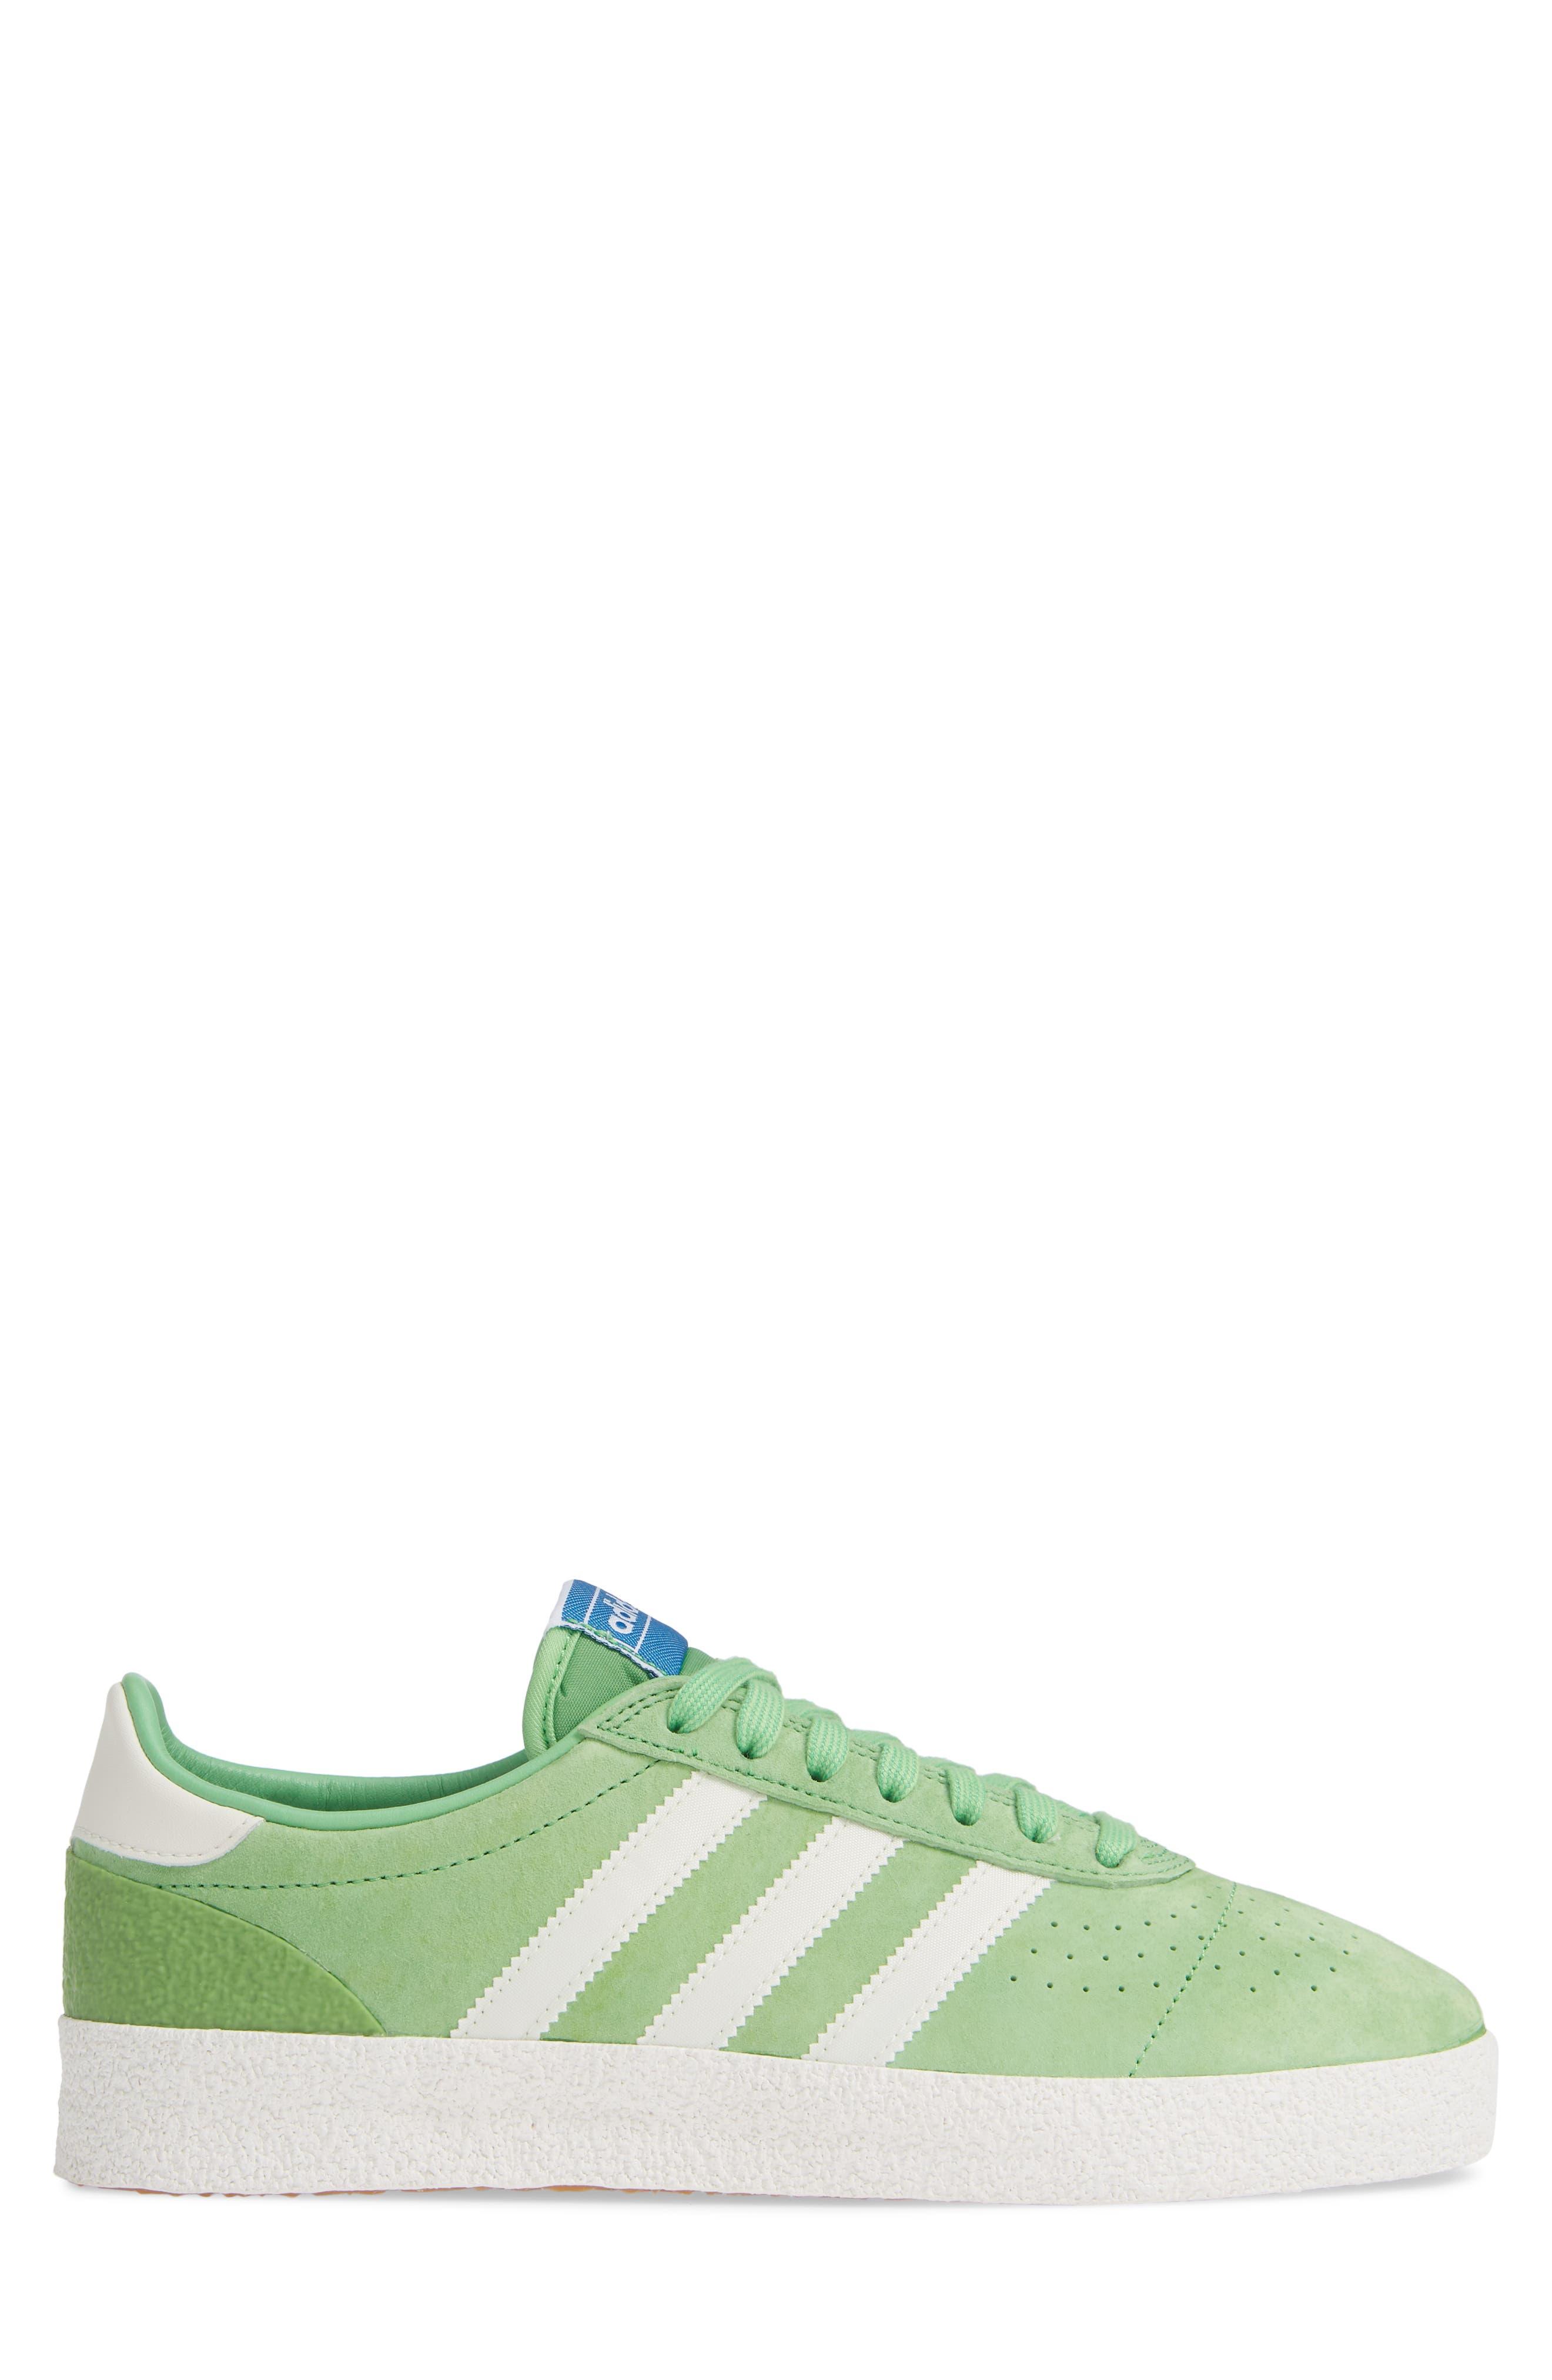 München Super Spezial Sneaker,                             Alternate thumbnail 3, color,                             INTENSE GREEN/ OFF WHITE